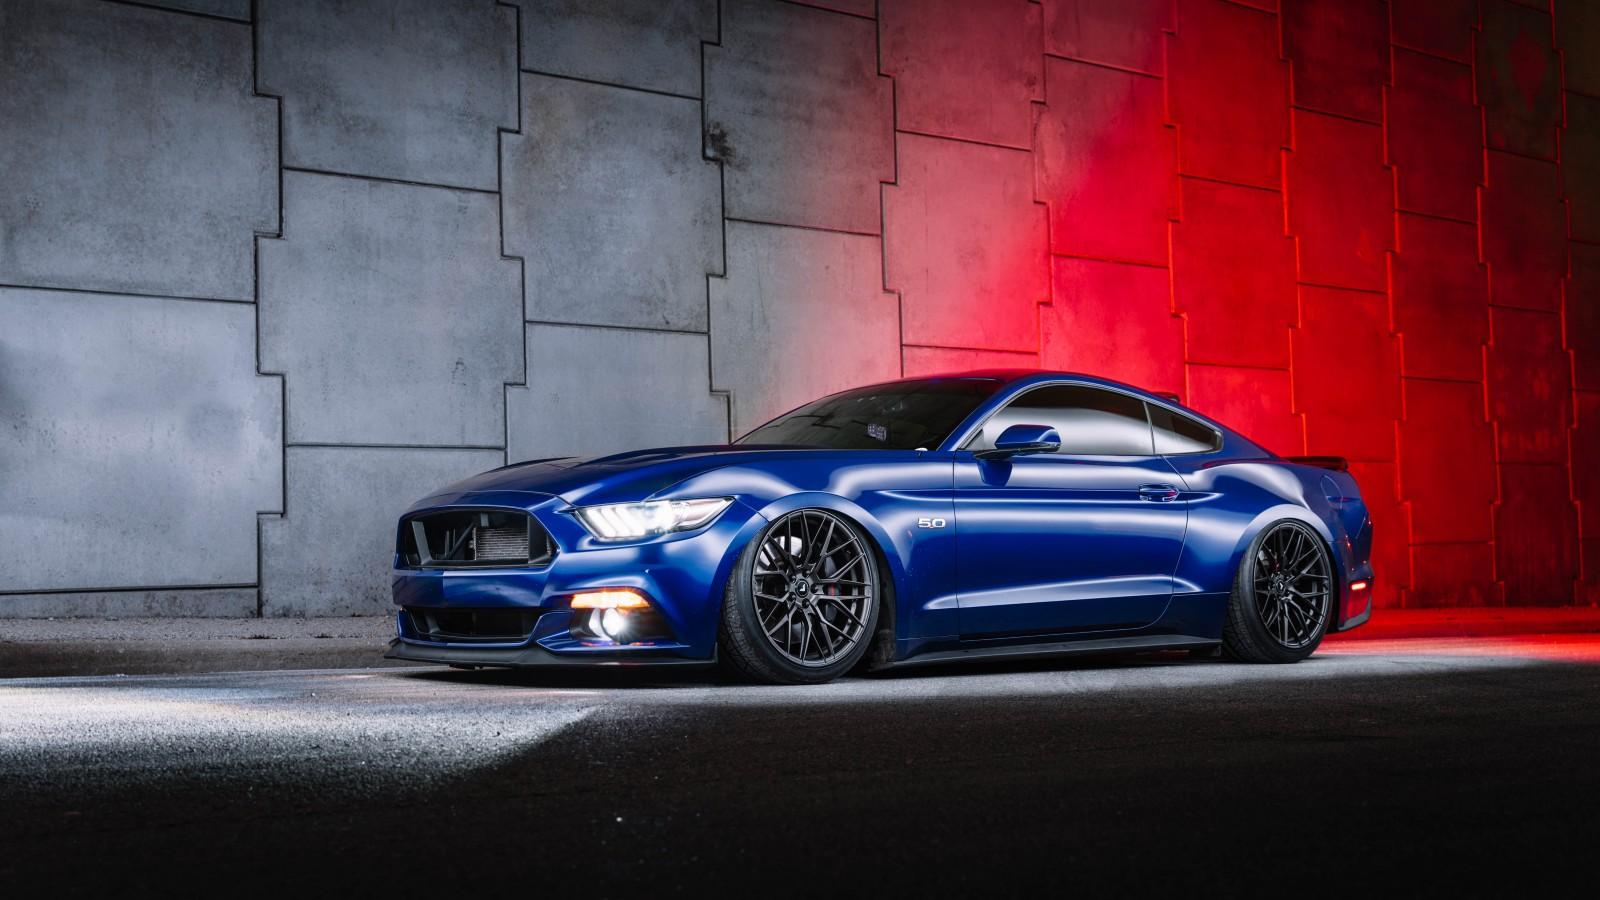 Ford Mustang Gt Carbon Graphite 5k 2 Wallpaper Hd Car